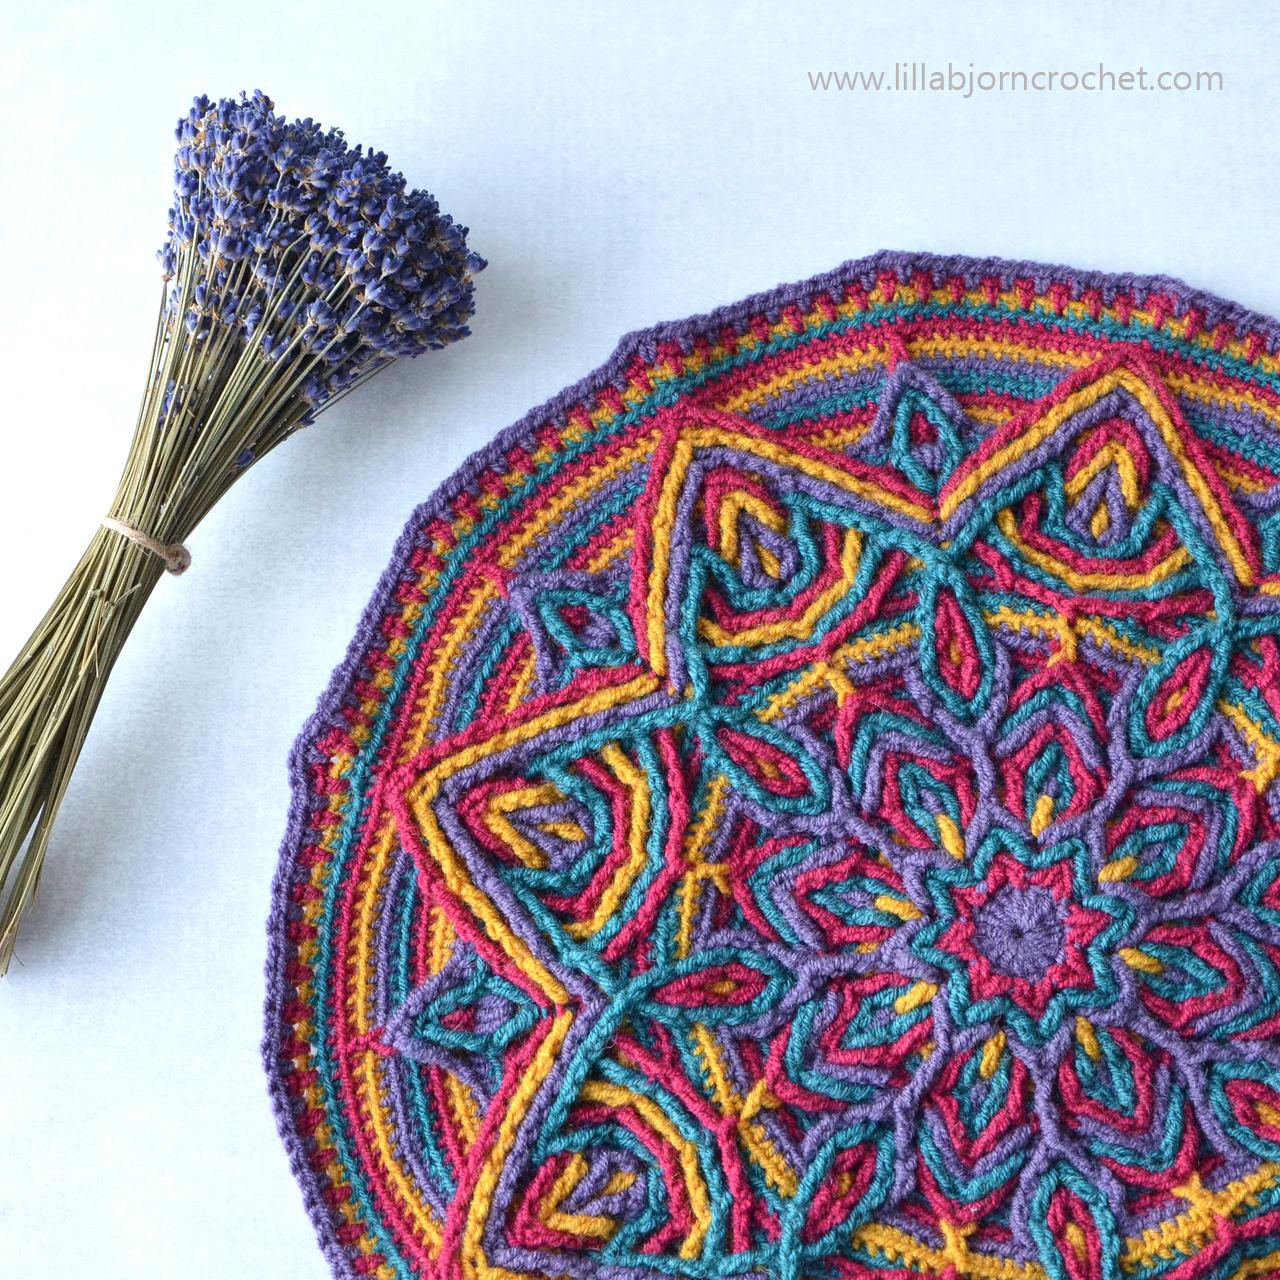 Illusion Mandala: new overlay crochet pattern | LillaBjörn's